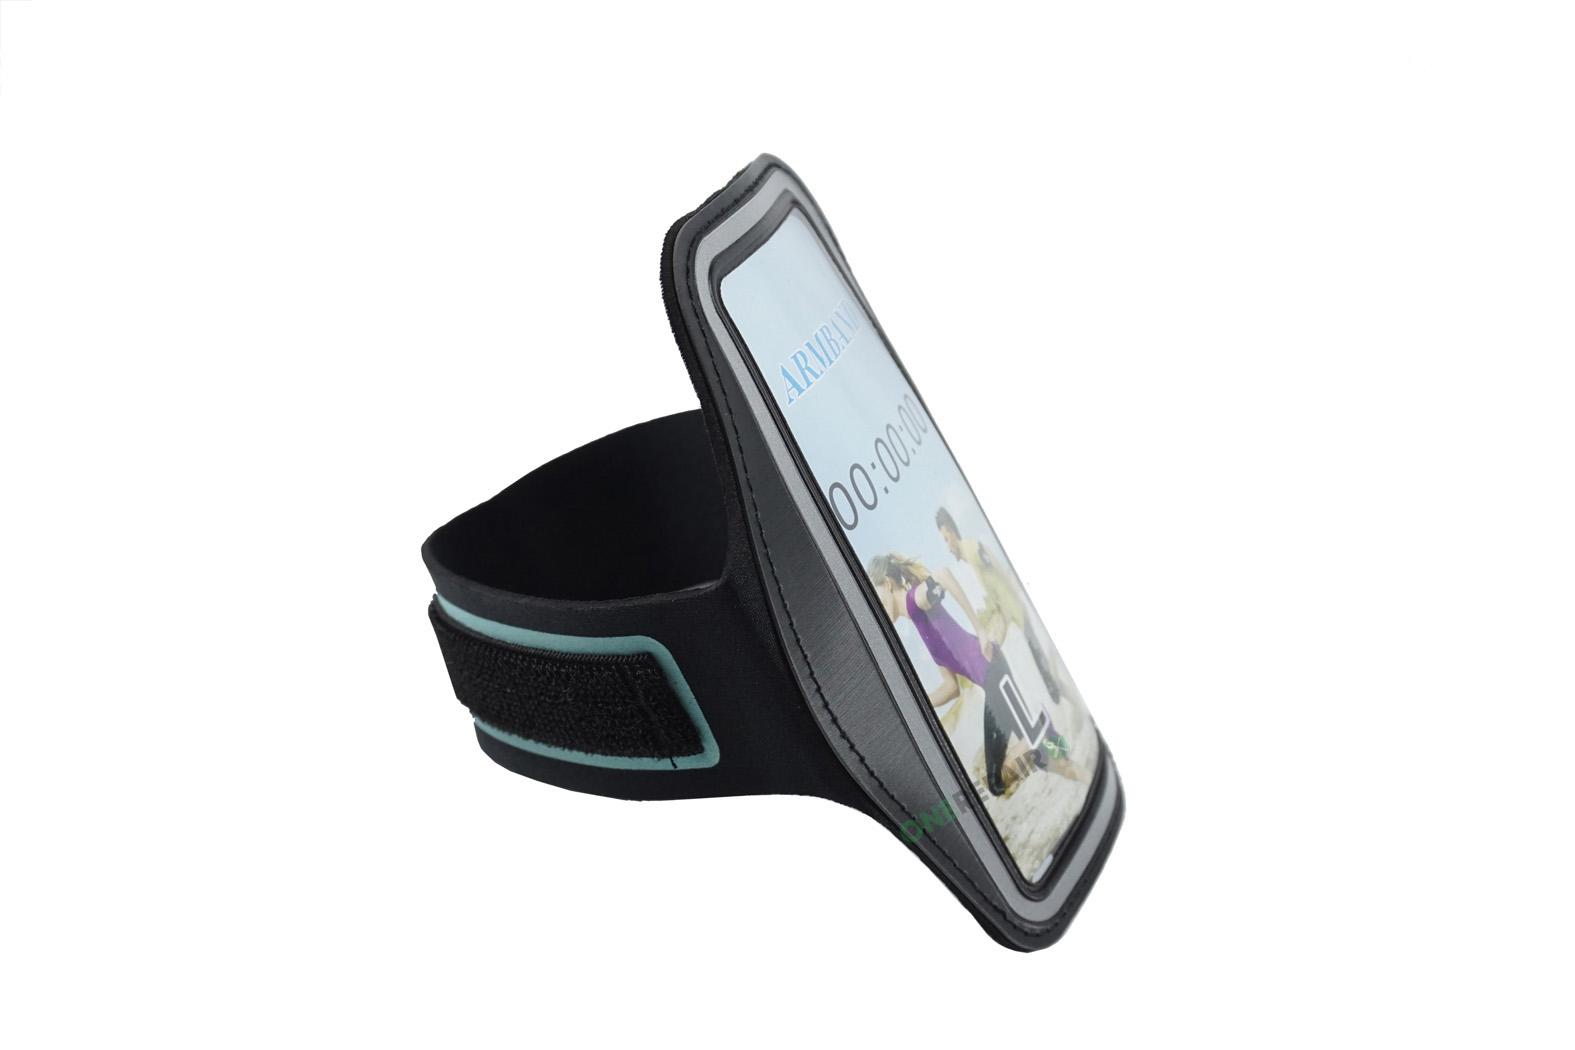 3519999_iPhone_Samsung_Huawei_Large_Loebearmbaand_Sportsarmbaand_Fitness_Loeb_Traening_Cover_Sort_OneRepair_00003